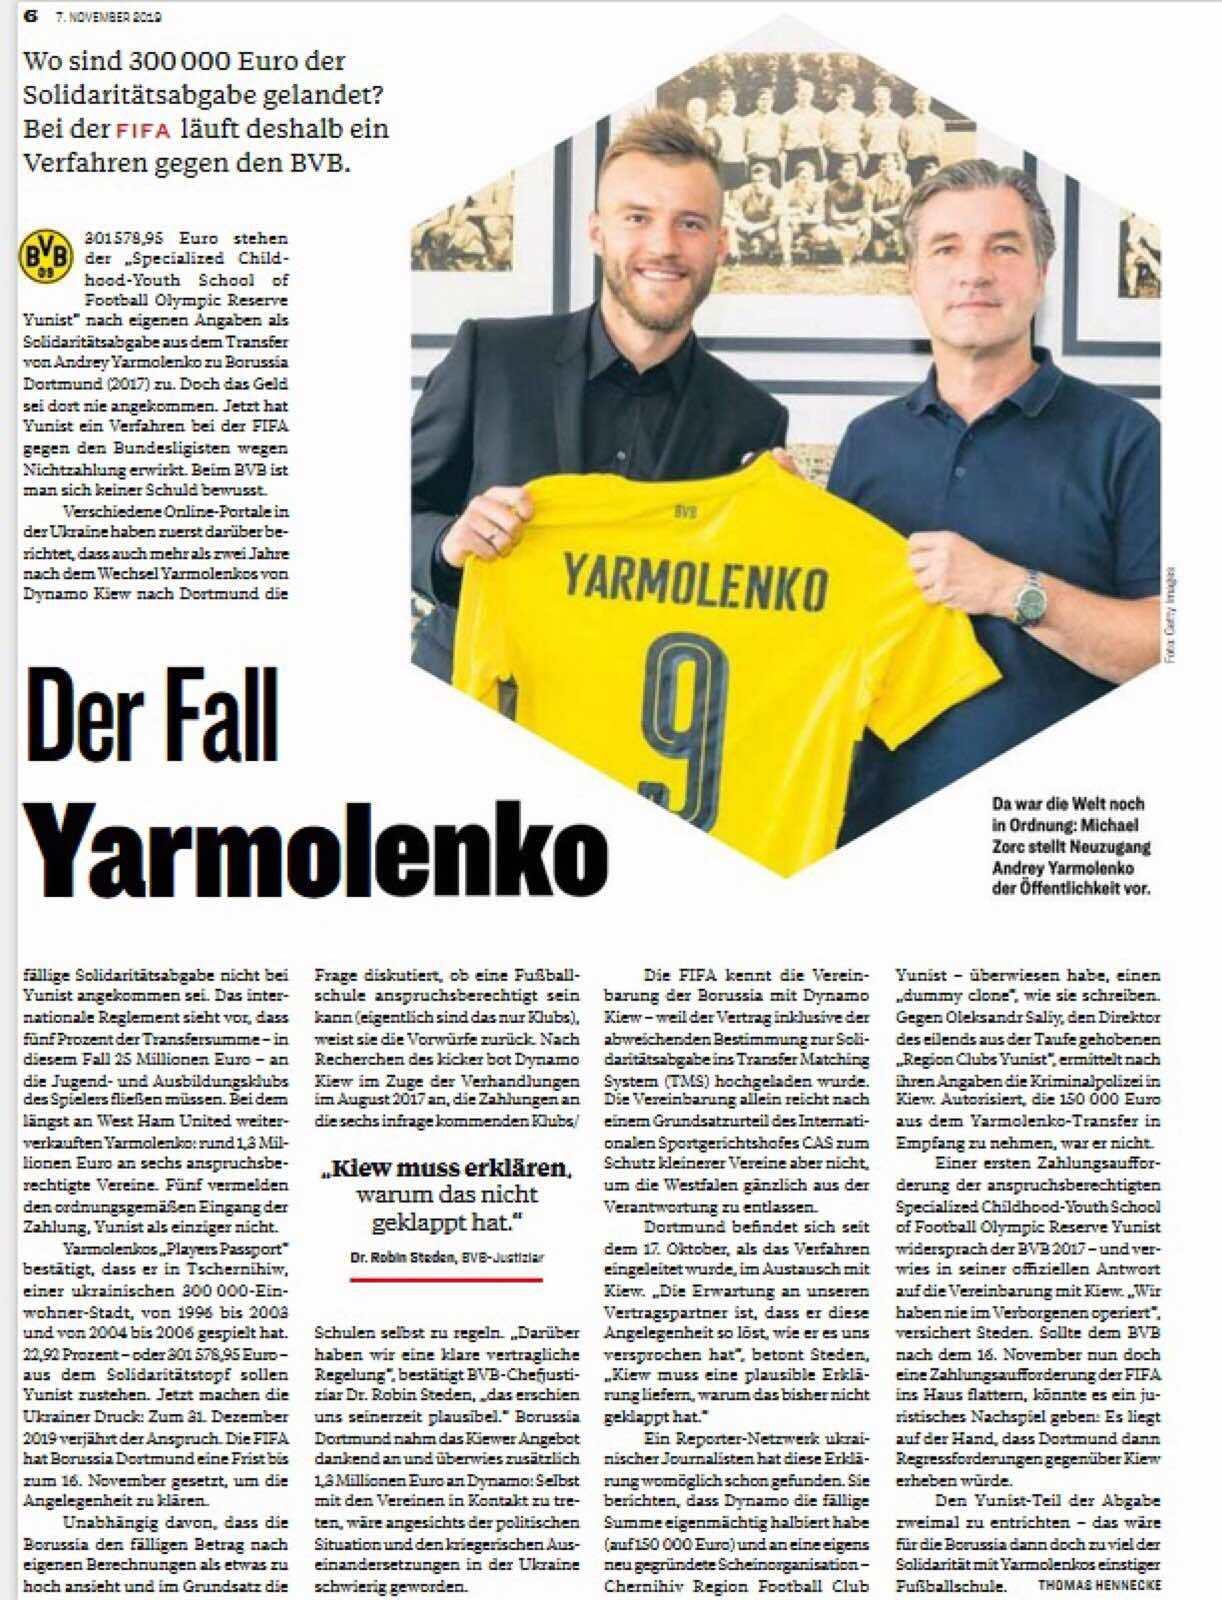 Kicker: куда пошли 300 000 евро платежа солидарности за трансфер Ярмоленко? - изображение 1